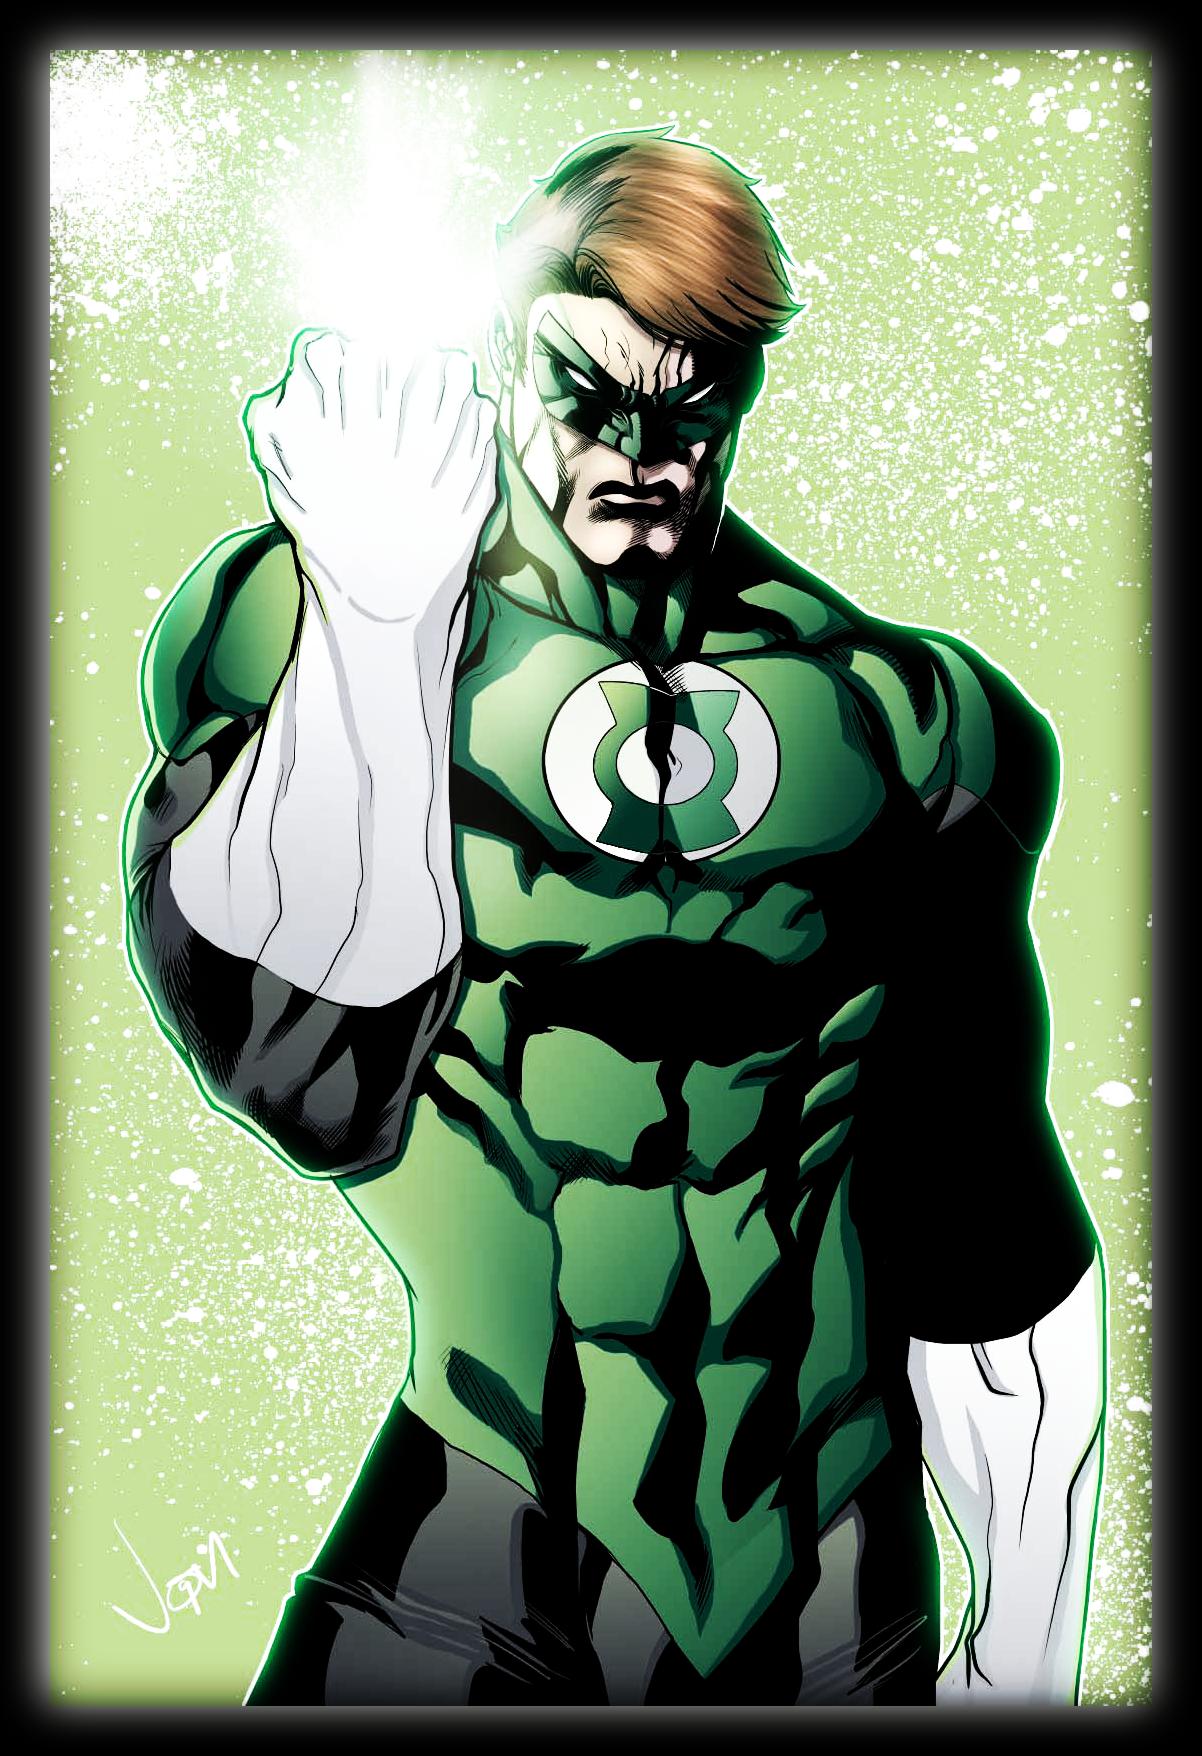 Kymgames Green Lantern Comics Green Lantern Corps Green Lantern